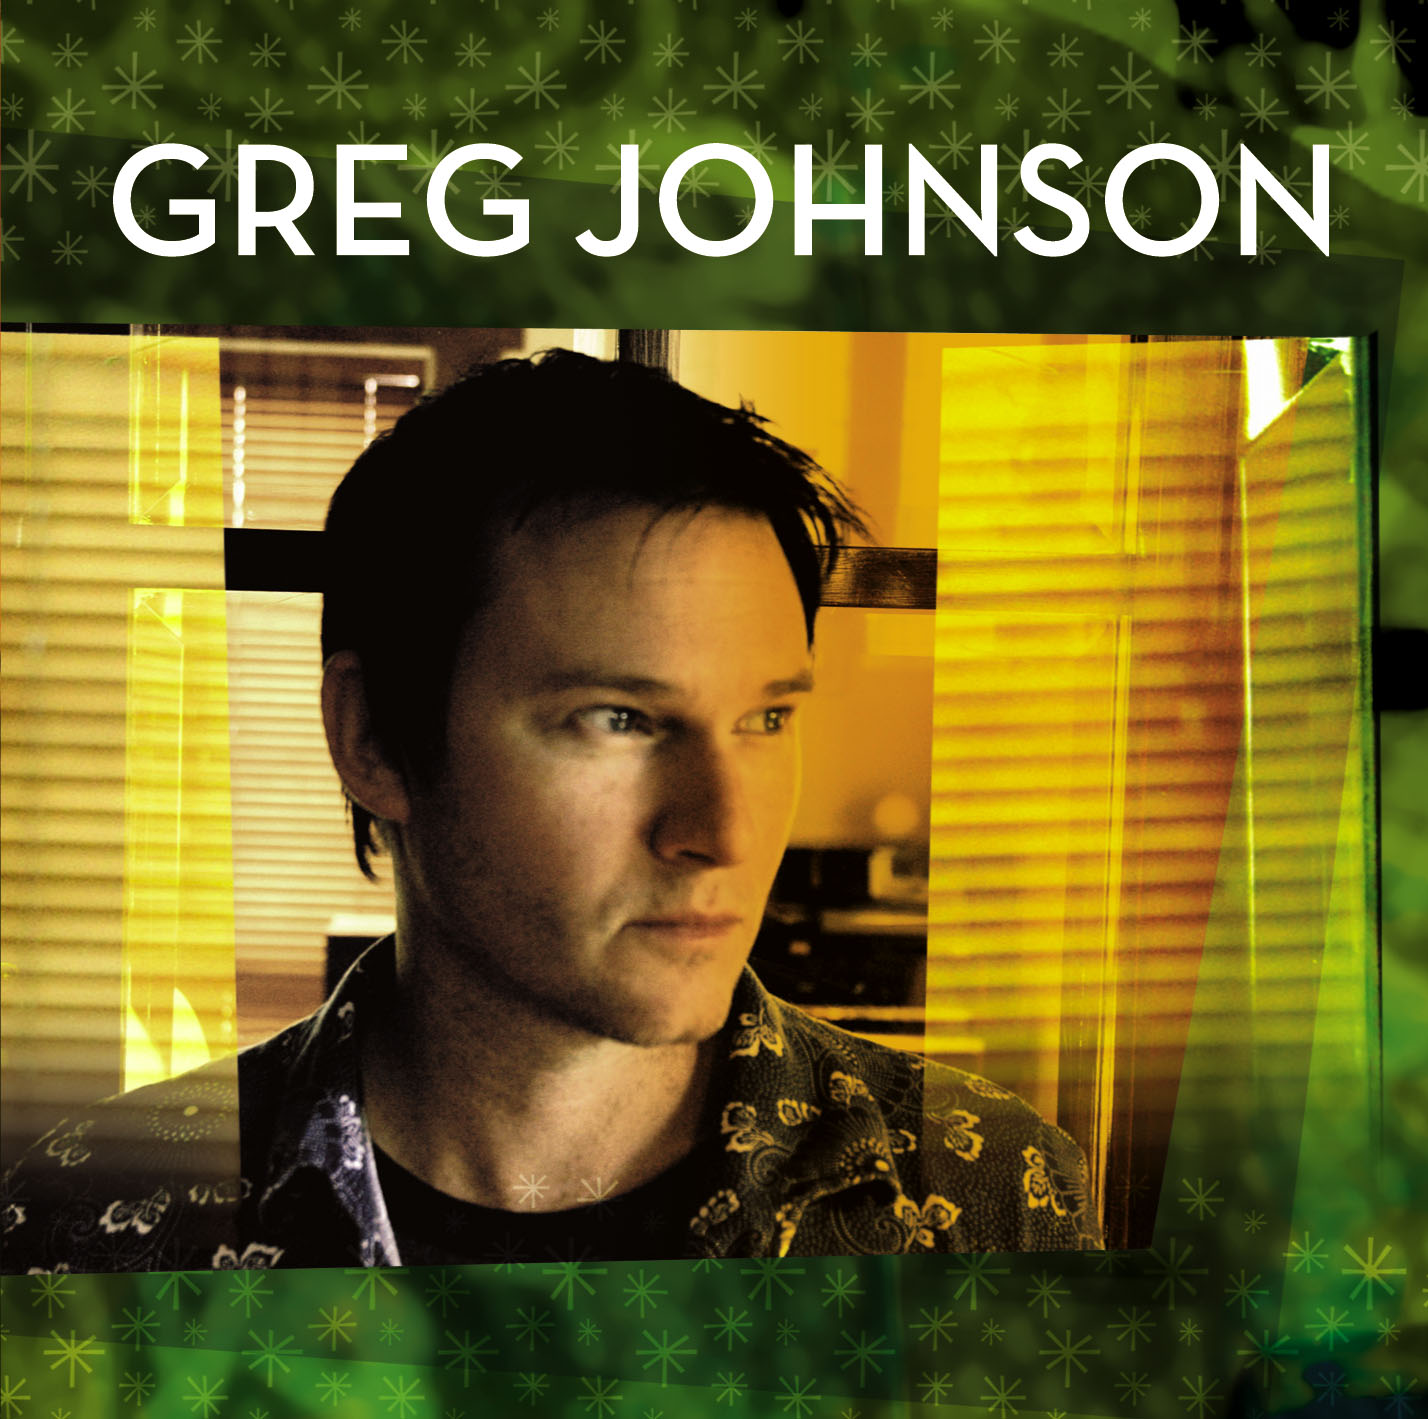 Greg Johnson - Here Comes The Caviar